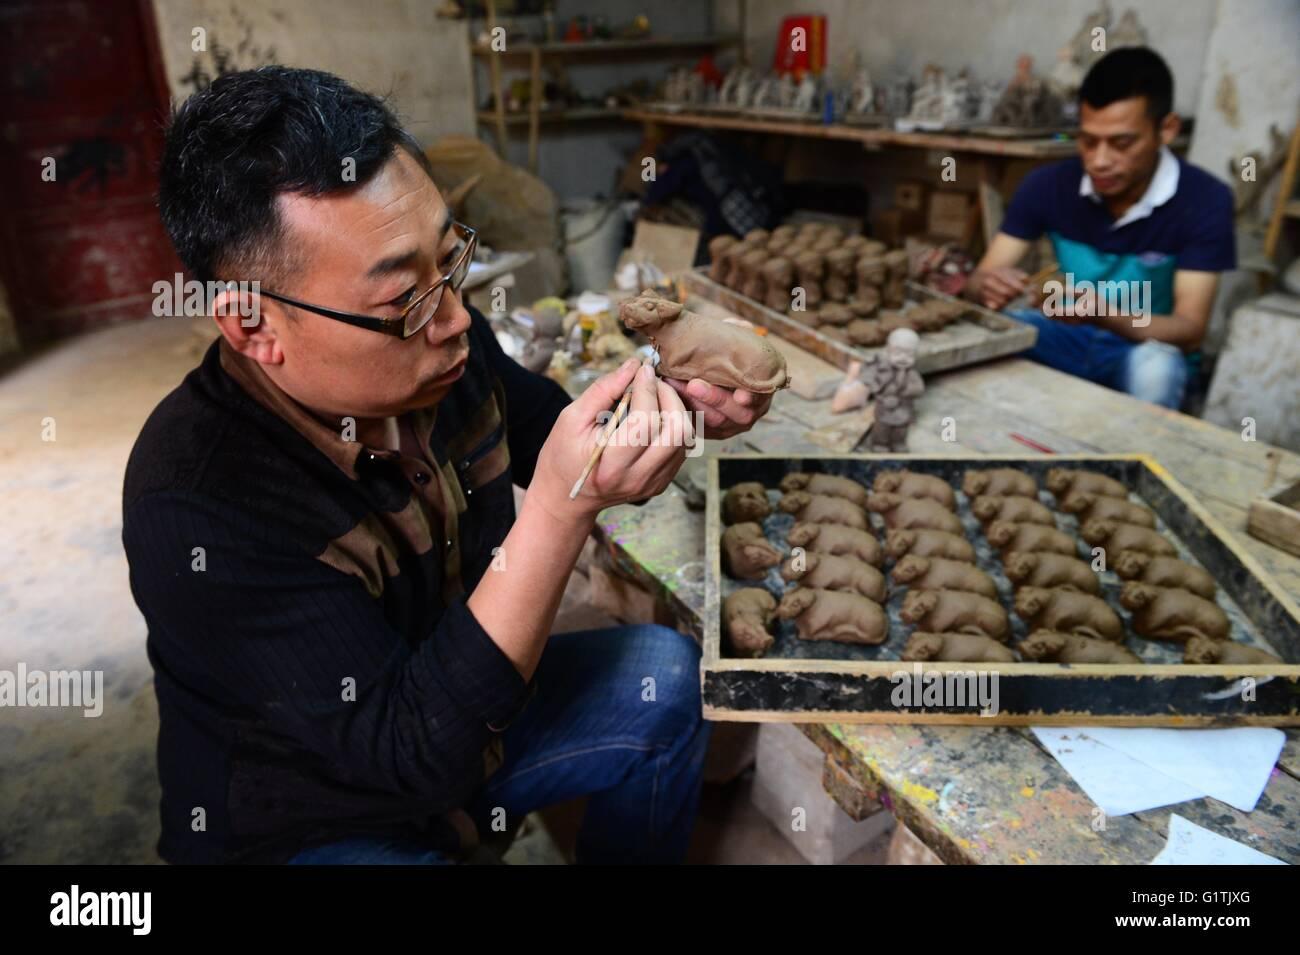 (160519) -- ZHENGZHOU, May 19, 2016 (Xinhua) -- Craftsmen work on clay sculptures at a workshop in Yangqitun Village - Stock Image